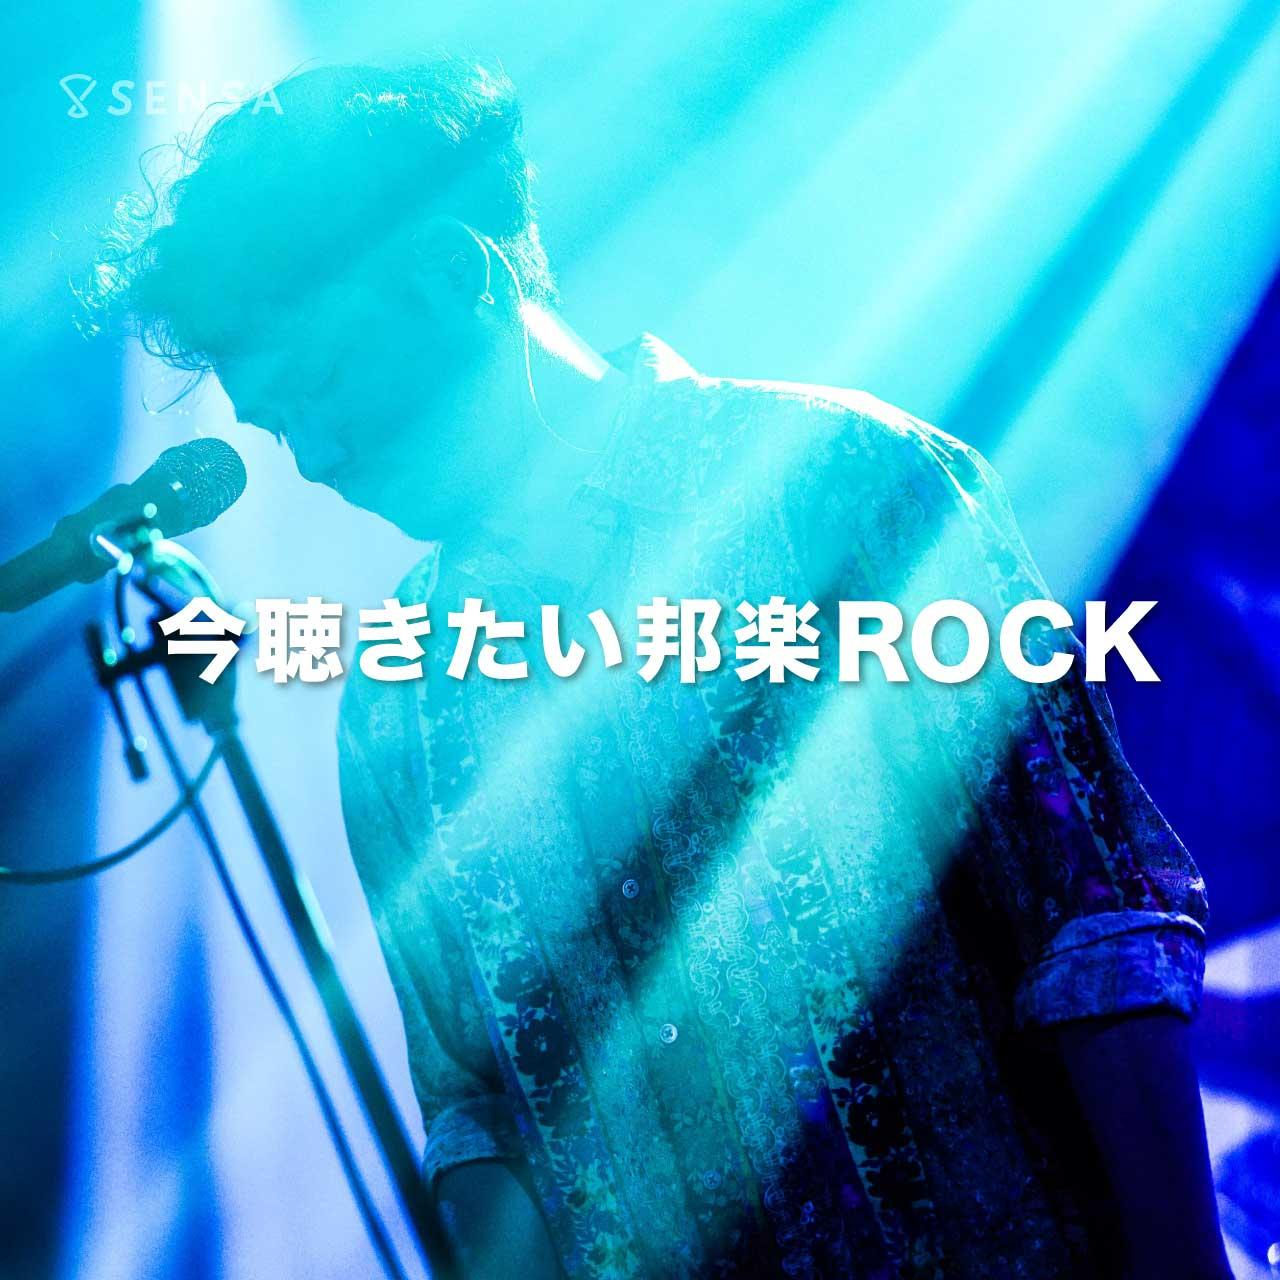 sensa_horock_202101_jk.jpg